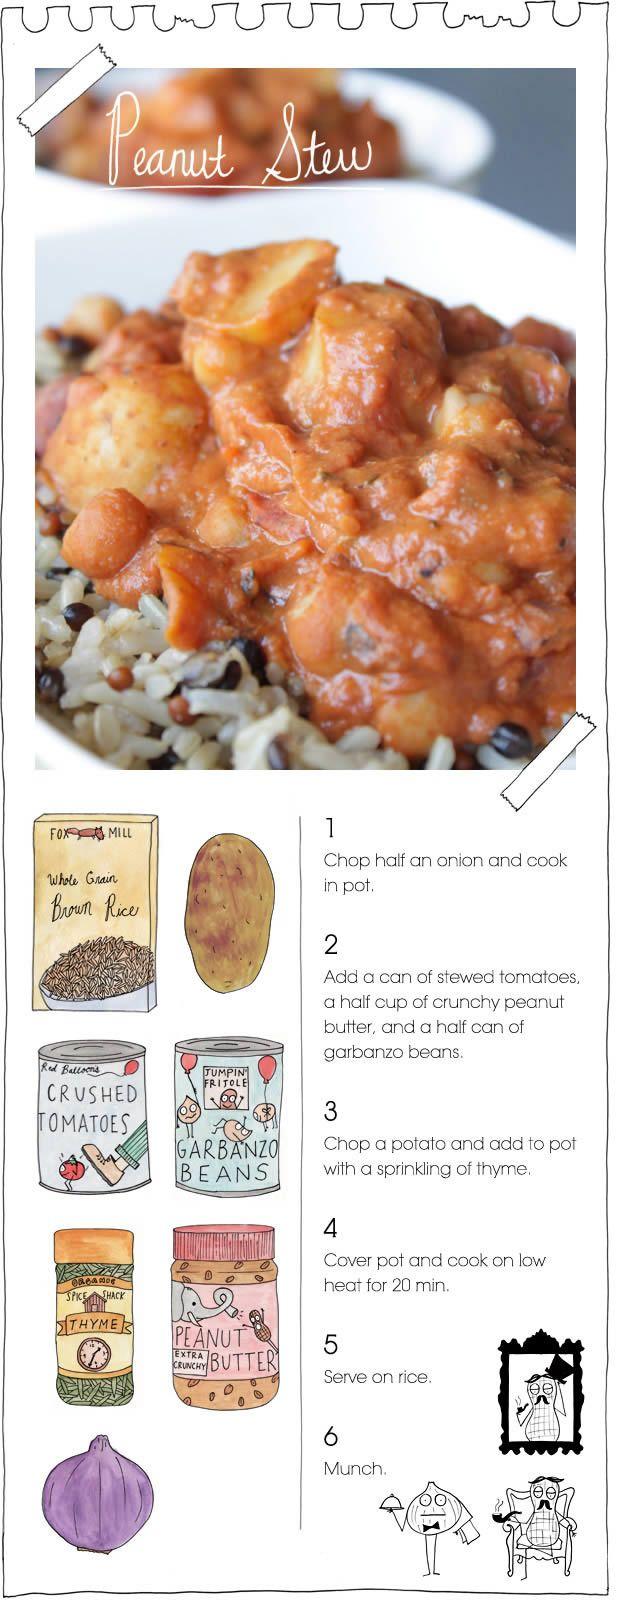 The Vegan Stoner's Peanut stew